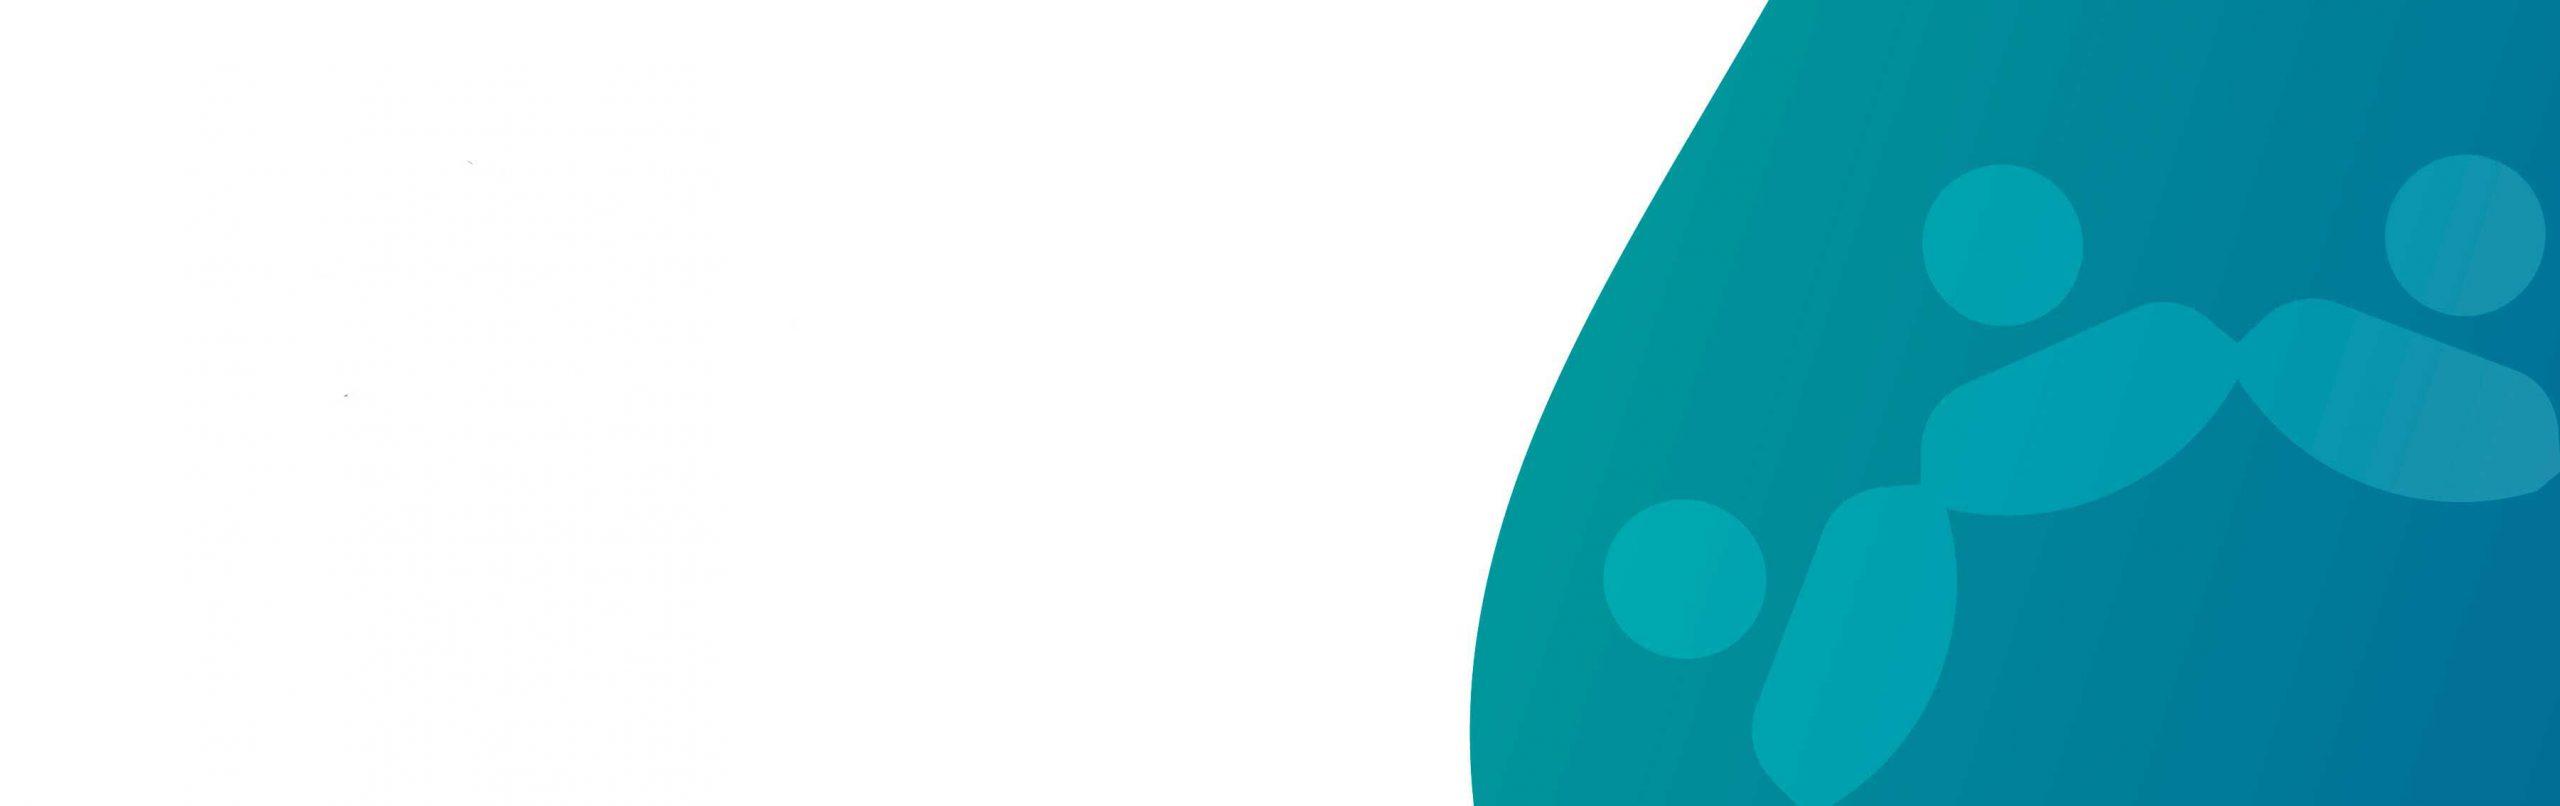 Time Care Forum 2020 senareläggs